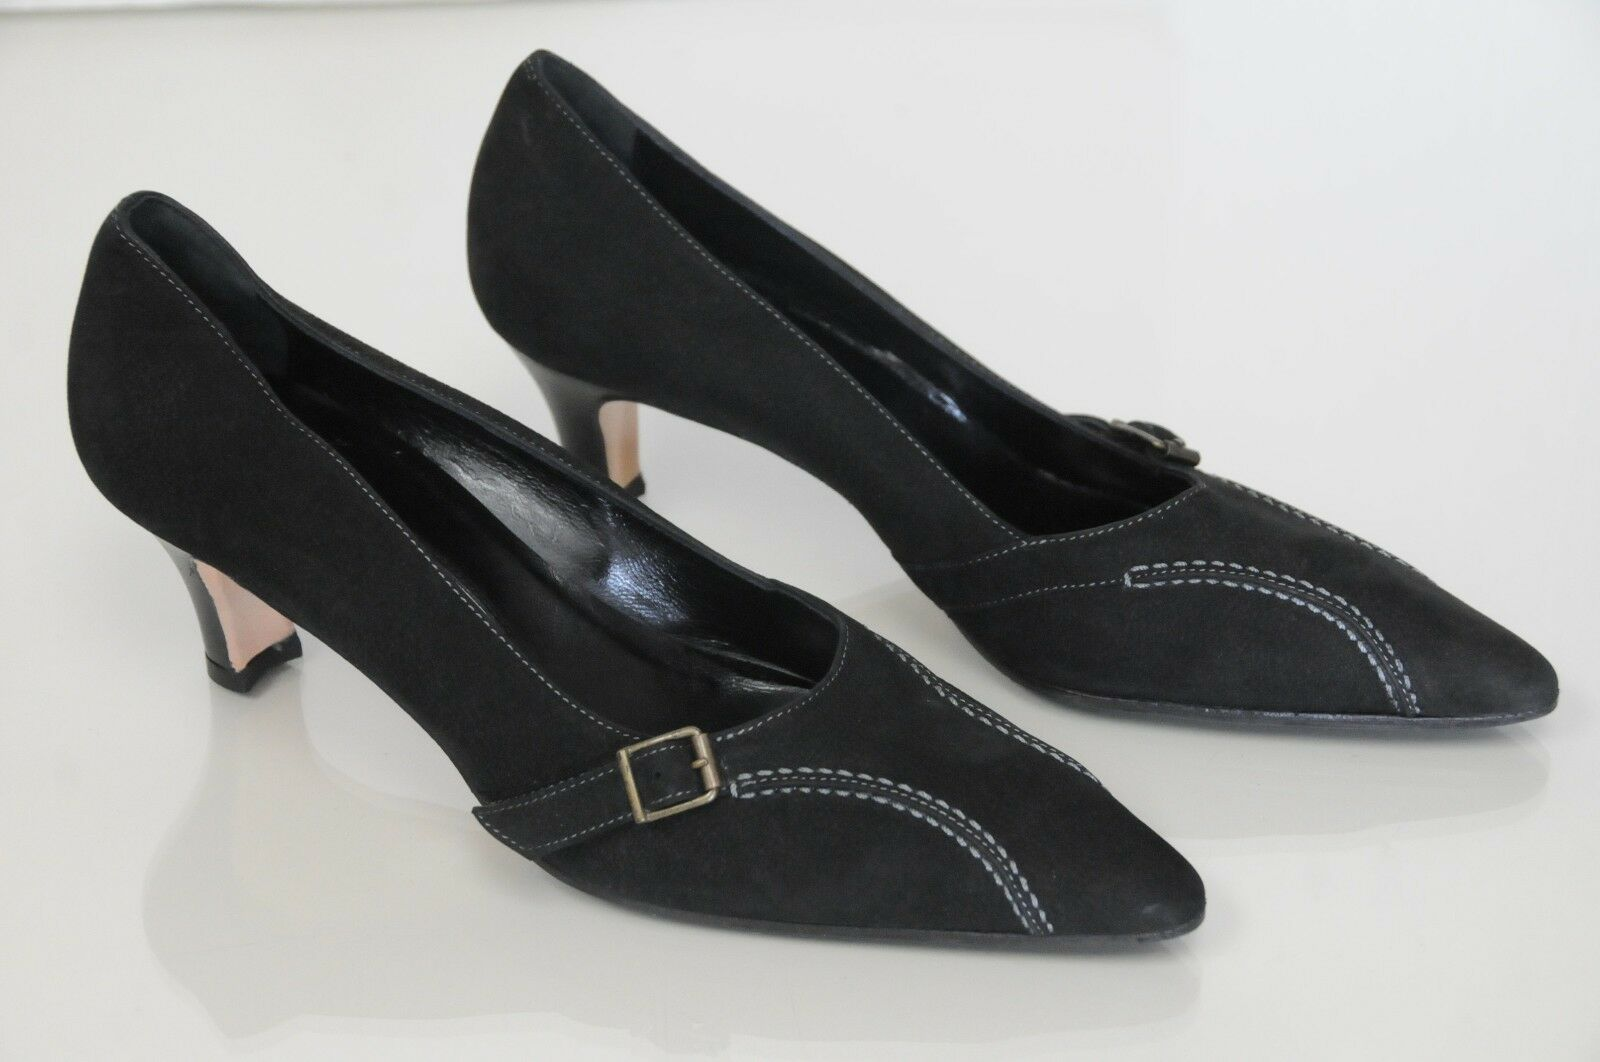 775 NEW MANOLO BLAHNIK BLACK NUBUCK Leather PUMPS BUCKLE HEELS SHOES 37 39